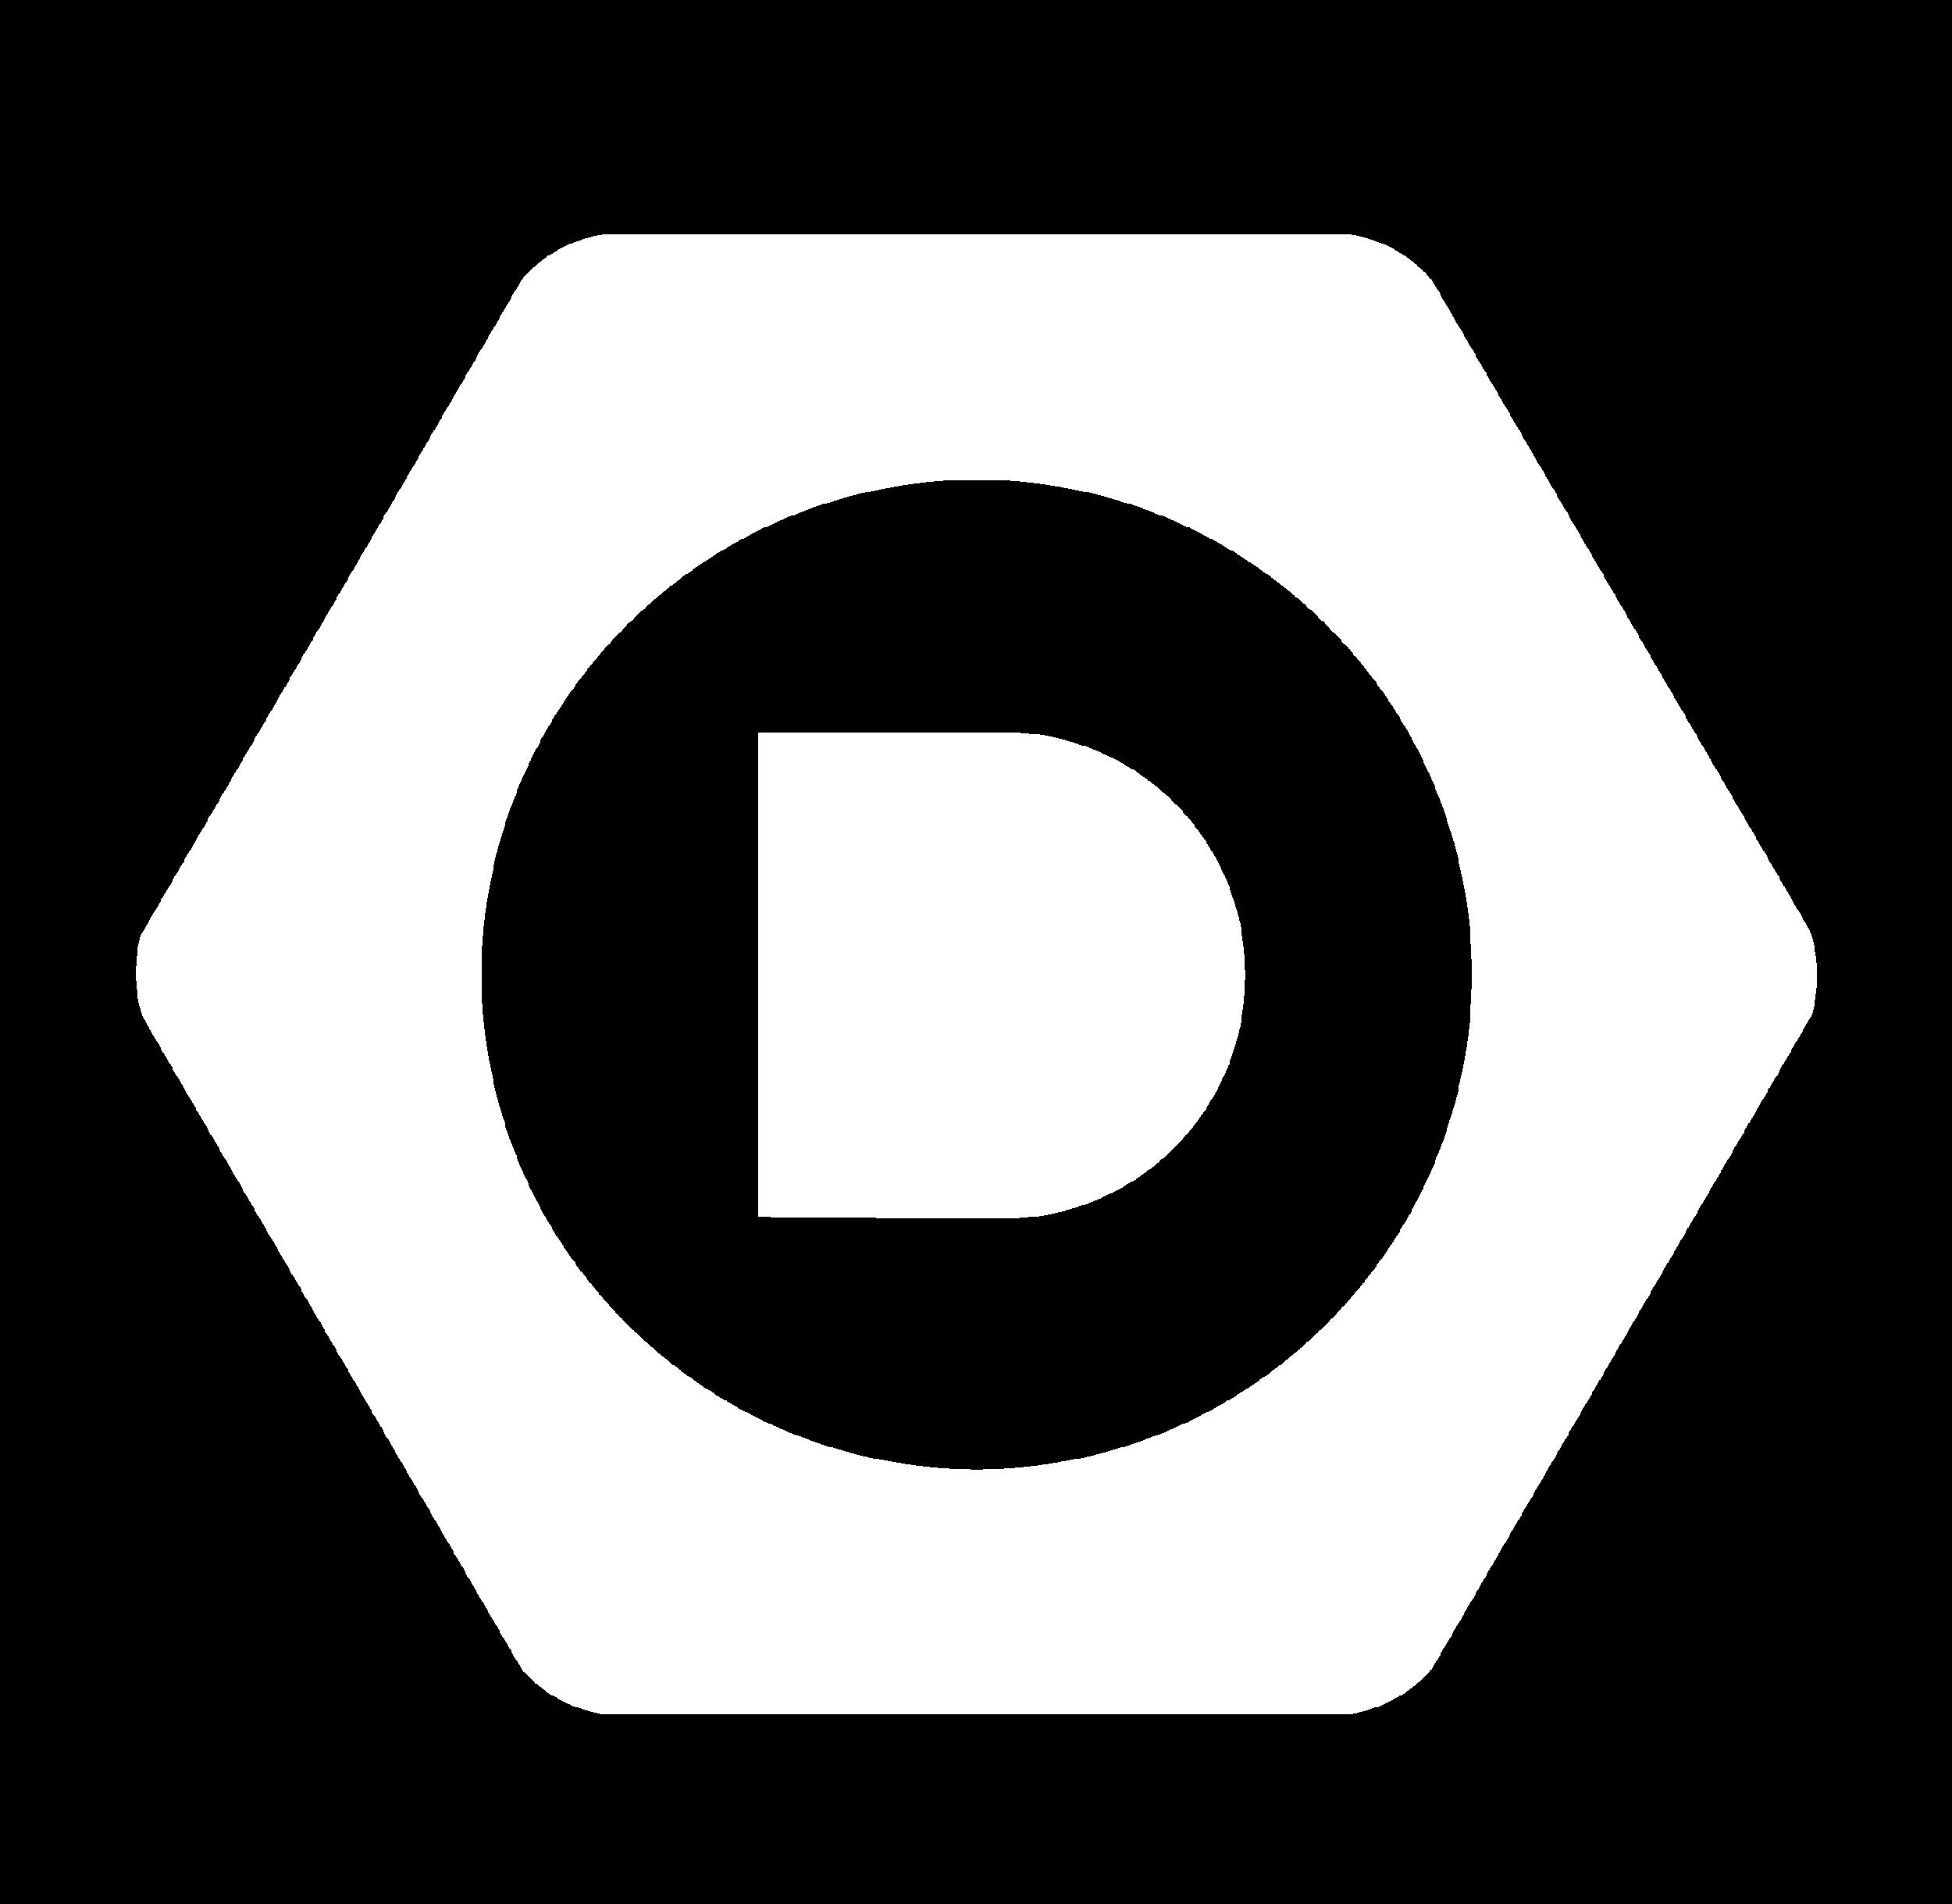 DANKOMOAKE-08.png